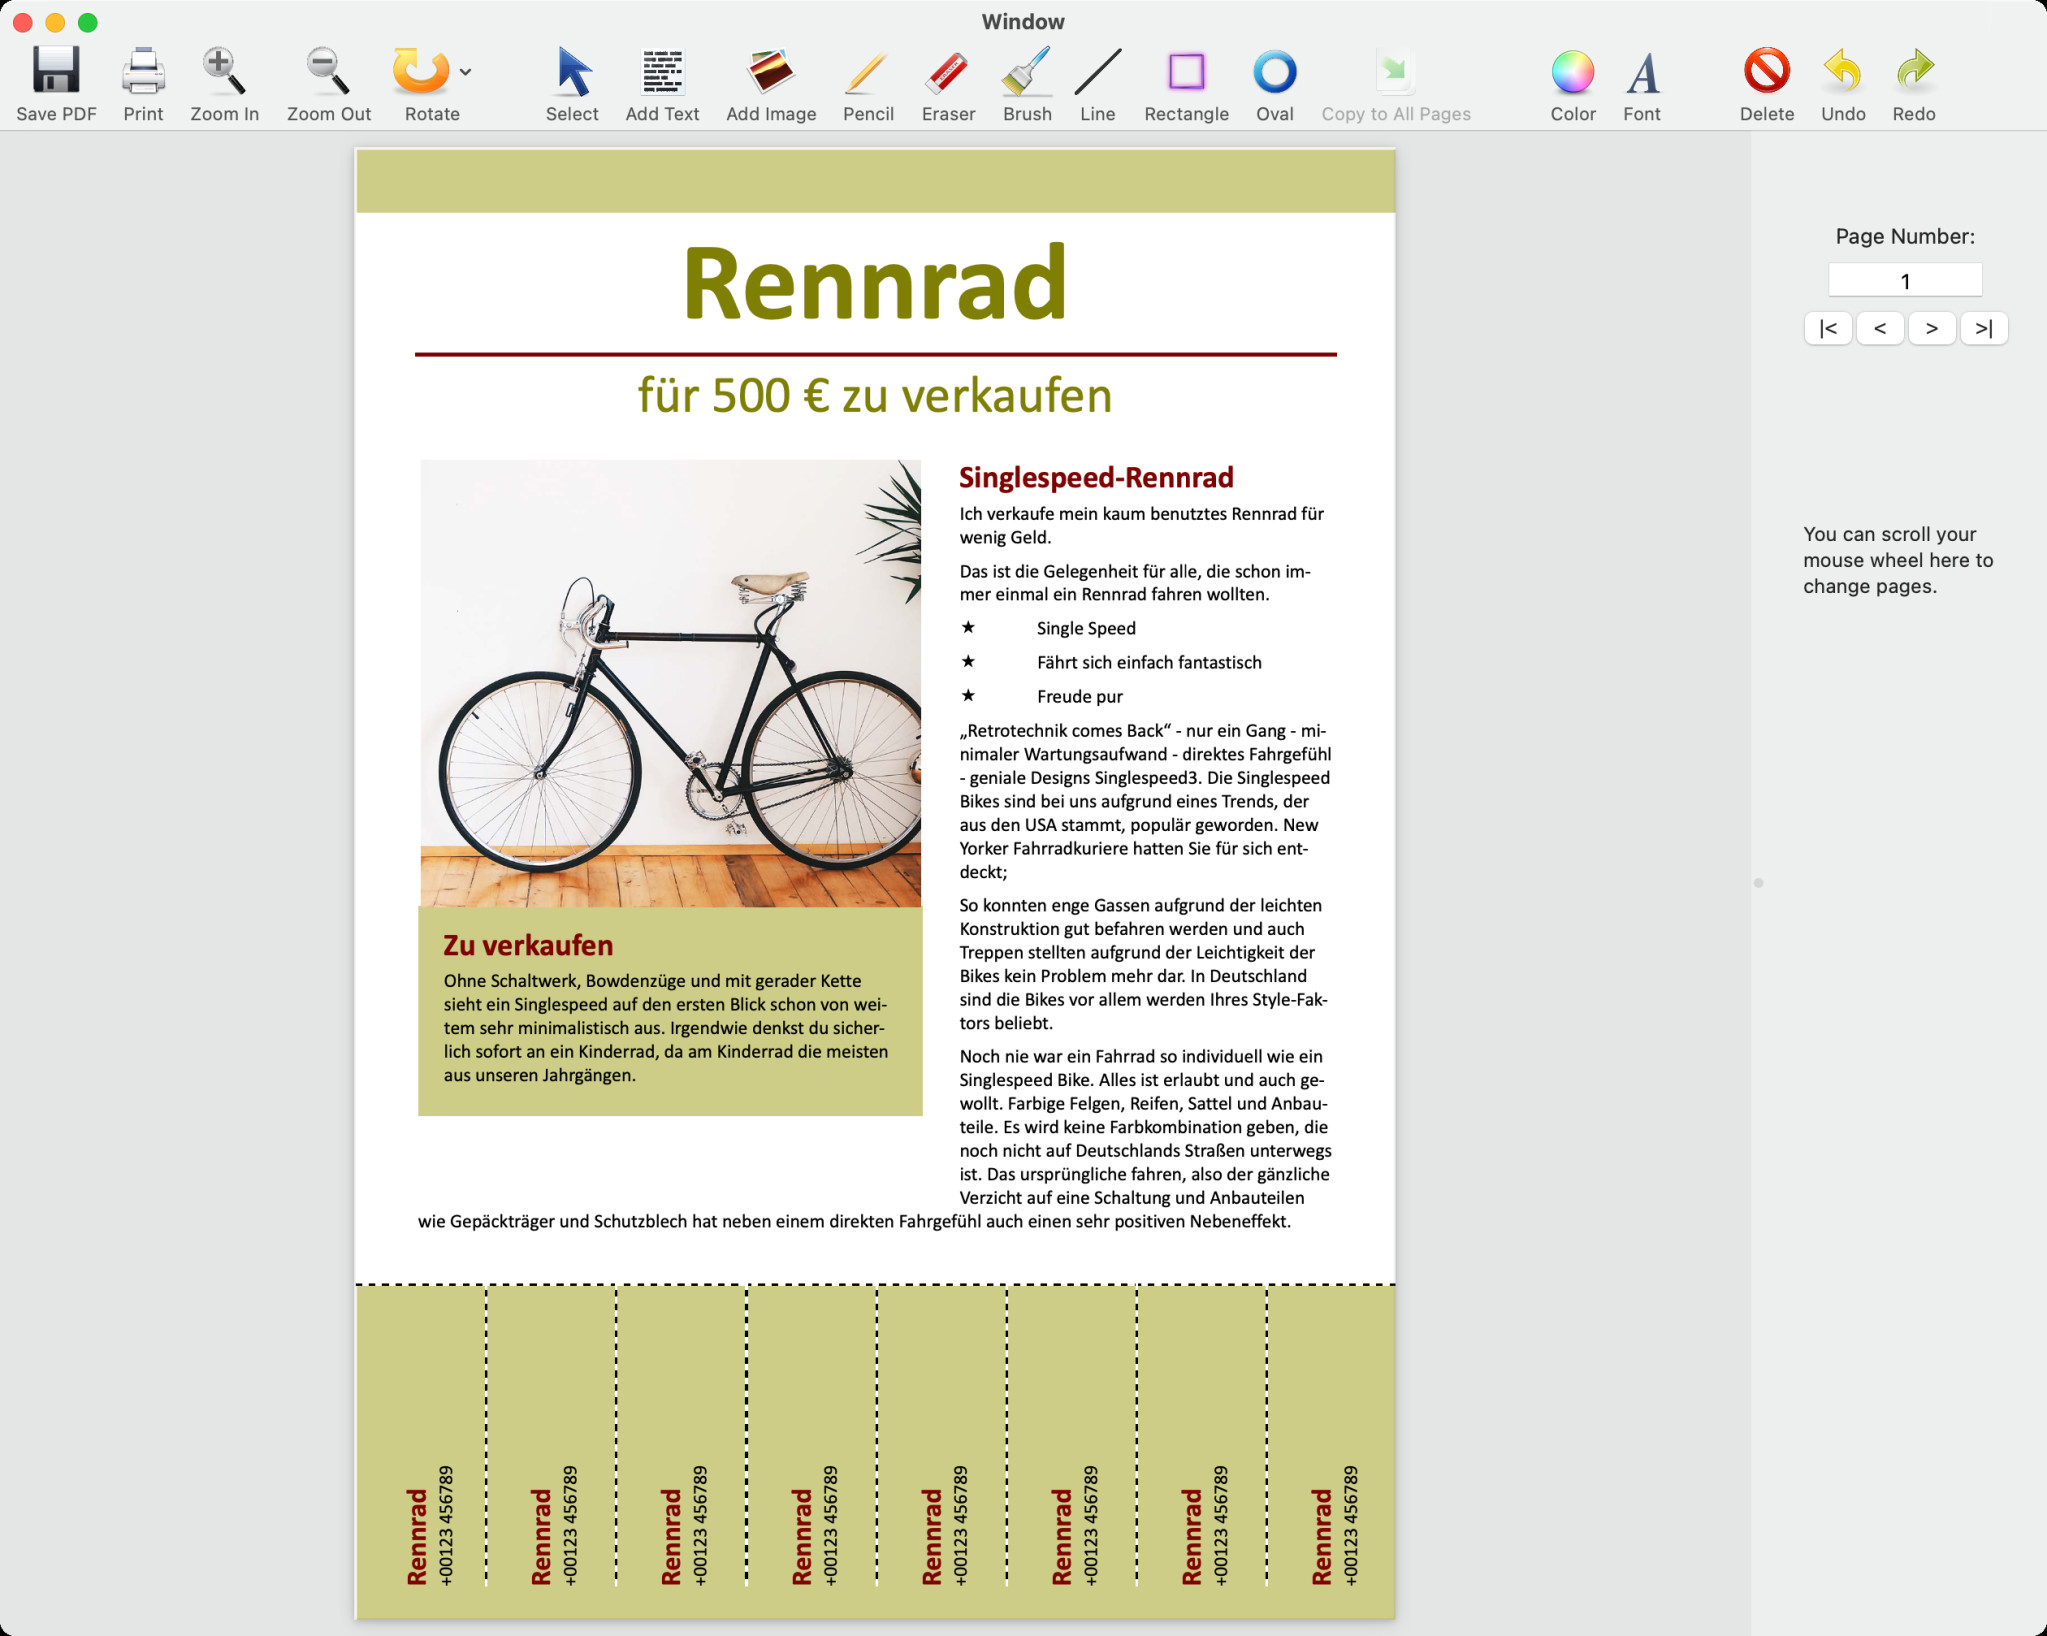 Screenshot 1 - PDF Editor (Mac)